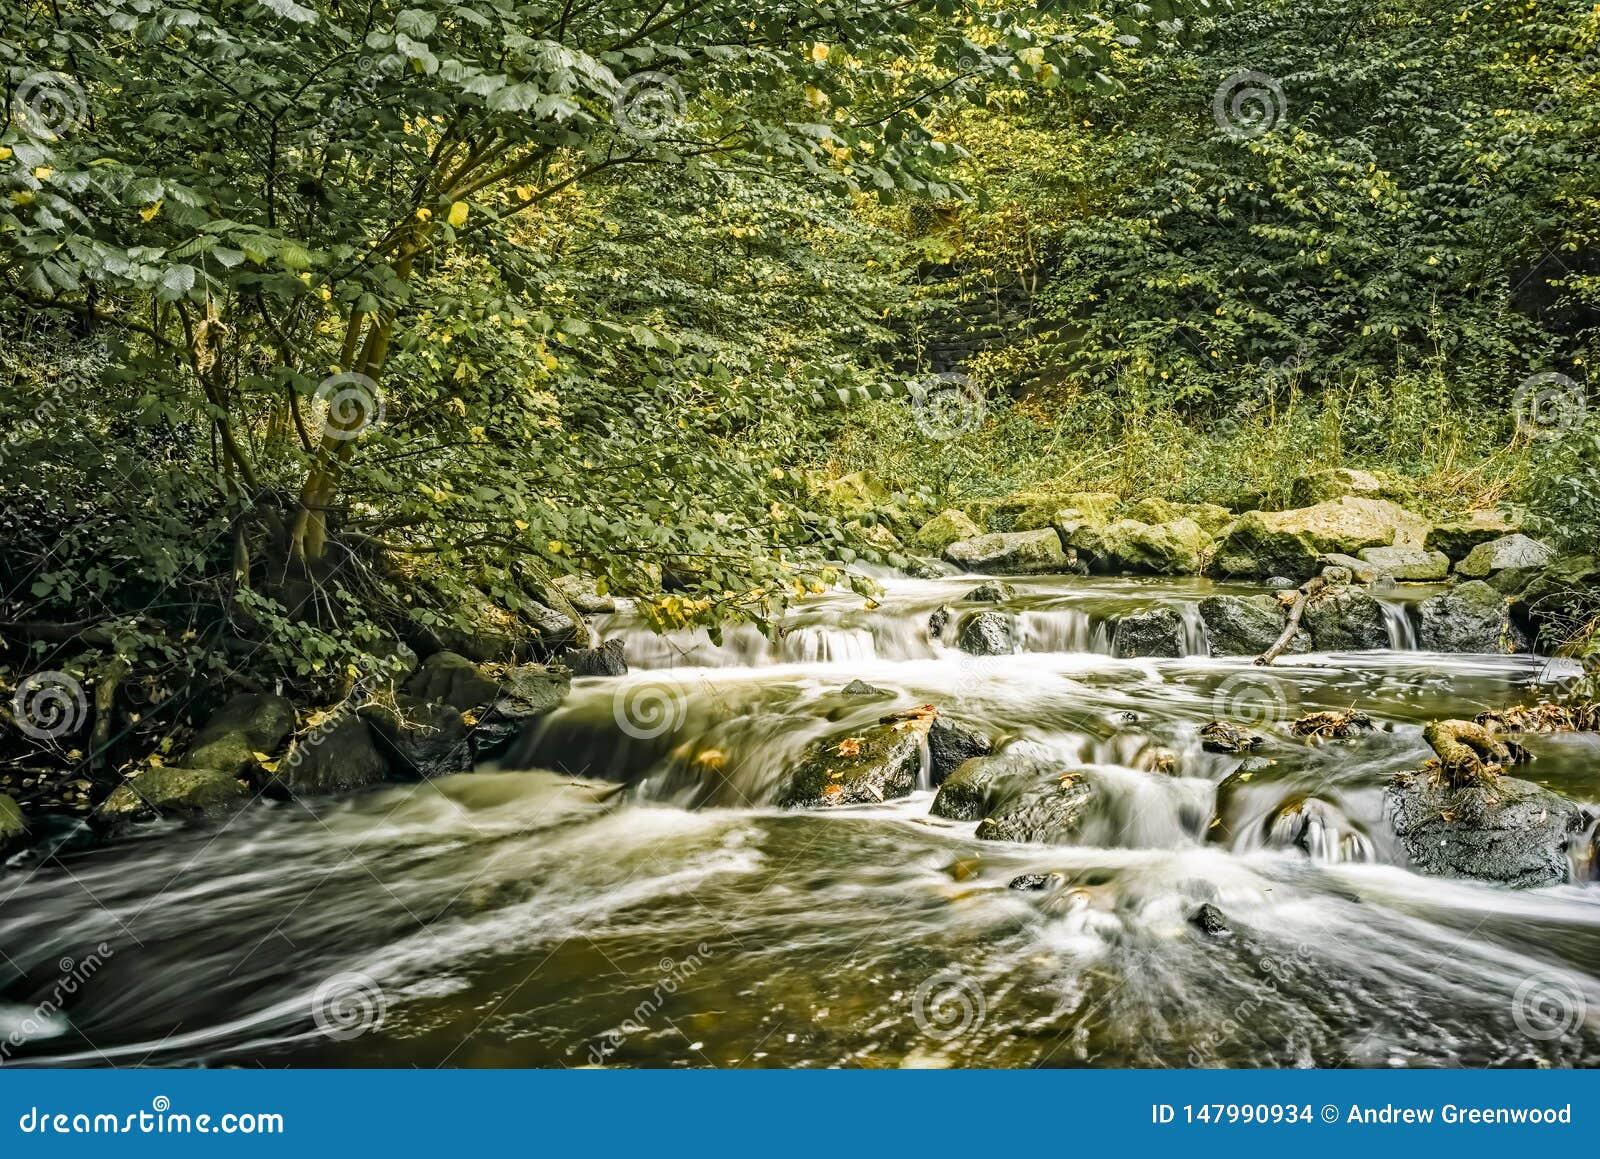 Langsamer laufender Fluss im Frühjahr